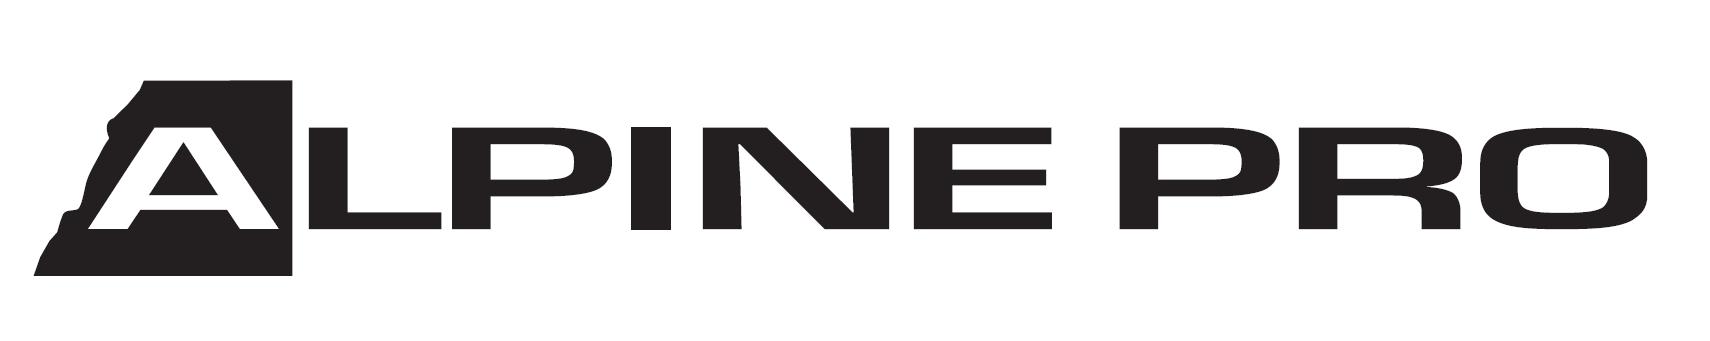 ALPINE PRO logo